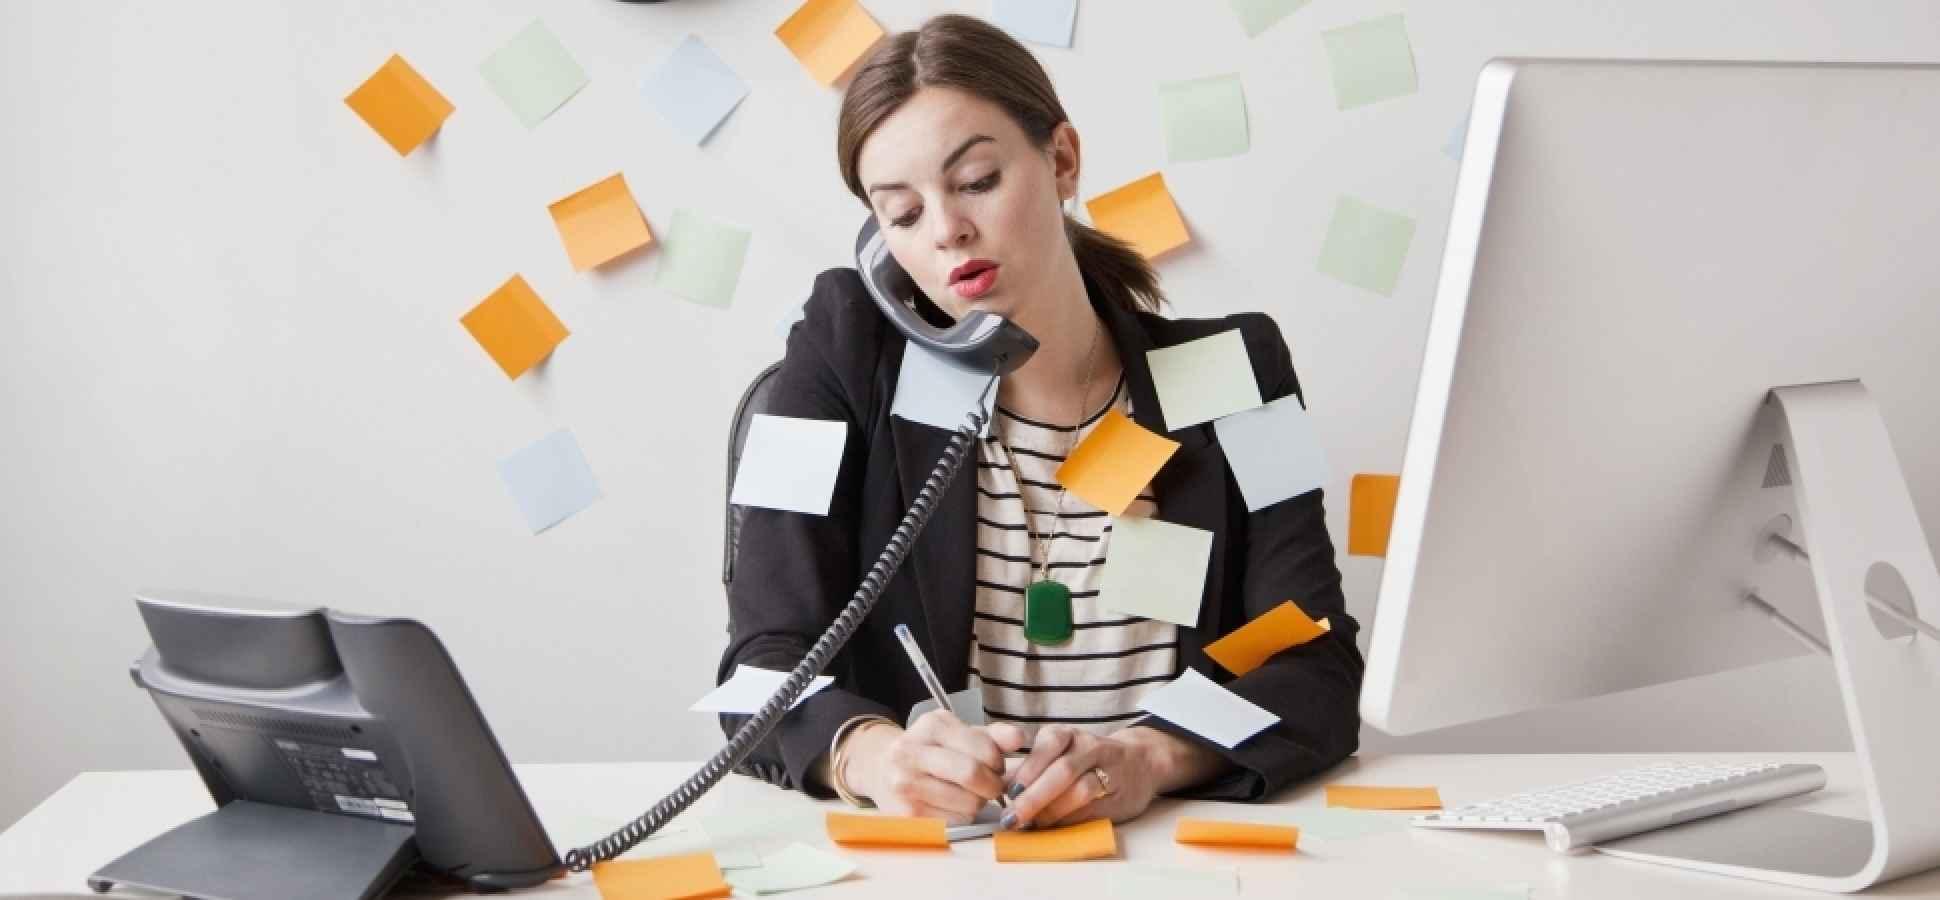 How Student Entrepreneurs Strike a Work-Life Balance